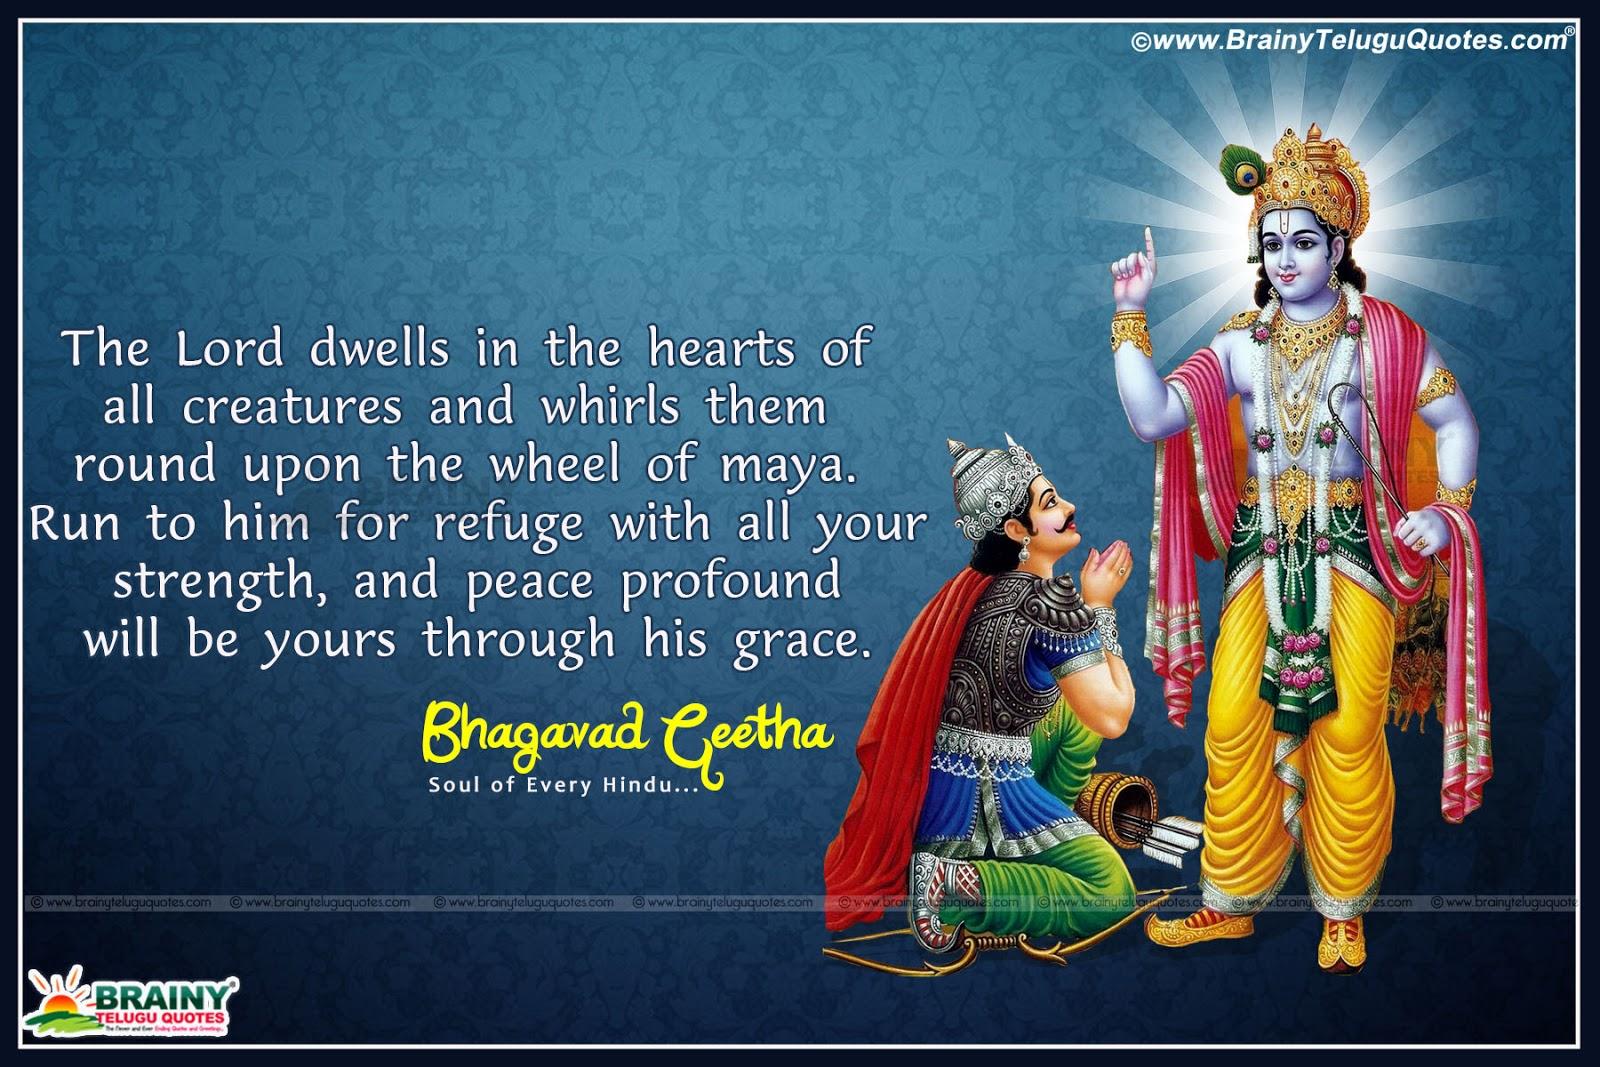 Famous Quotes Bhagavad Gita In English Brainyteluguquotes